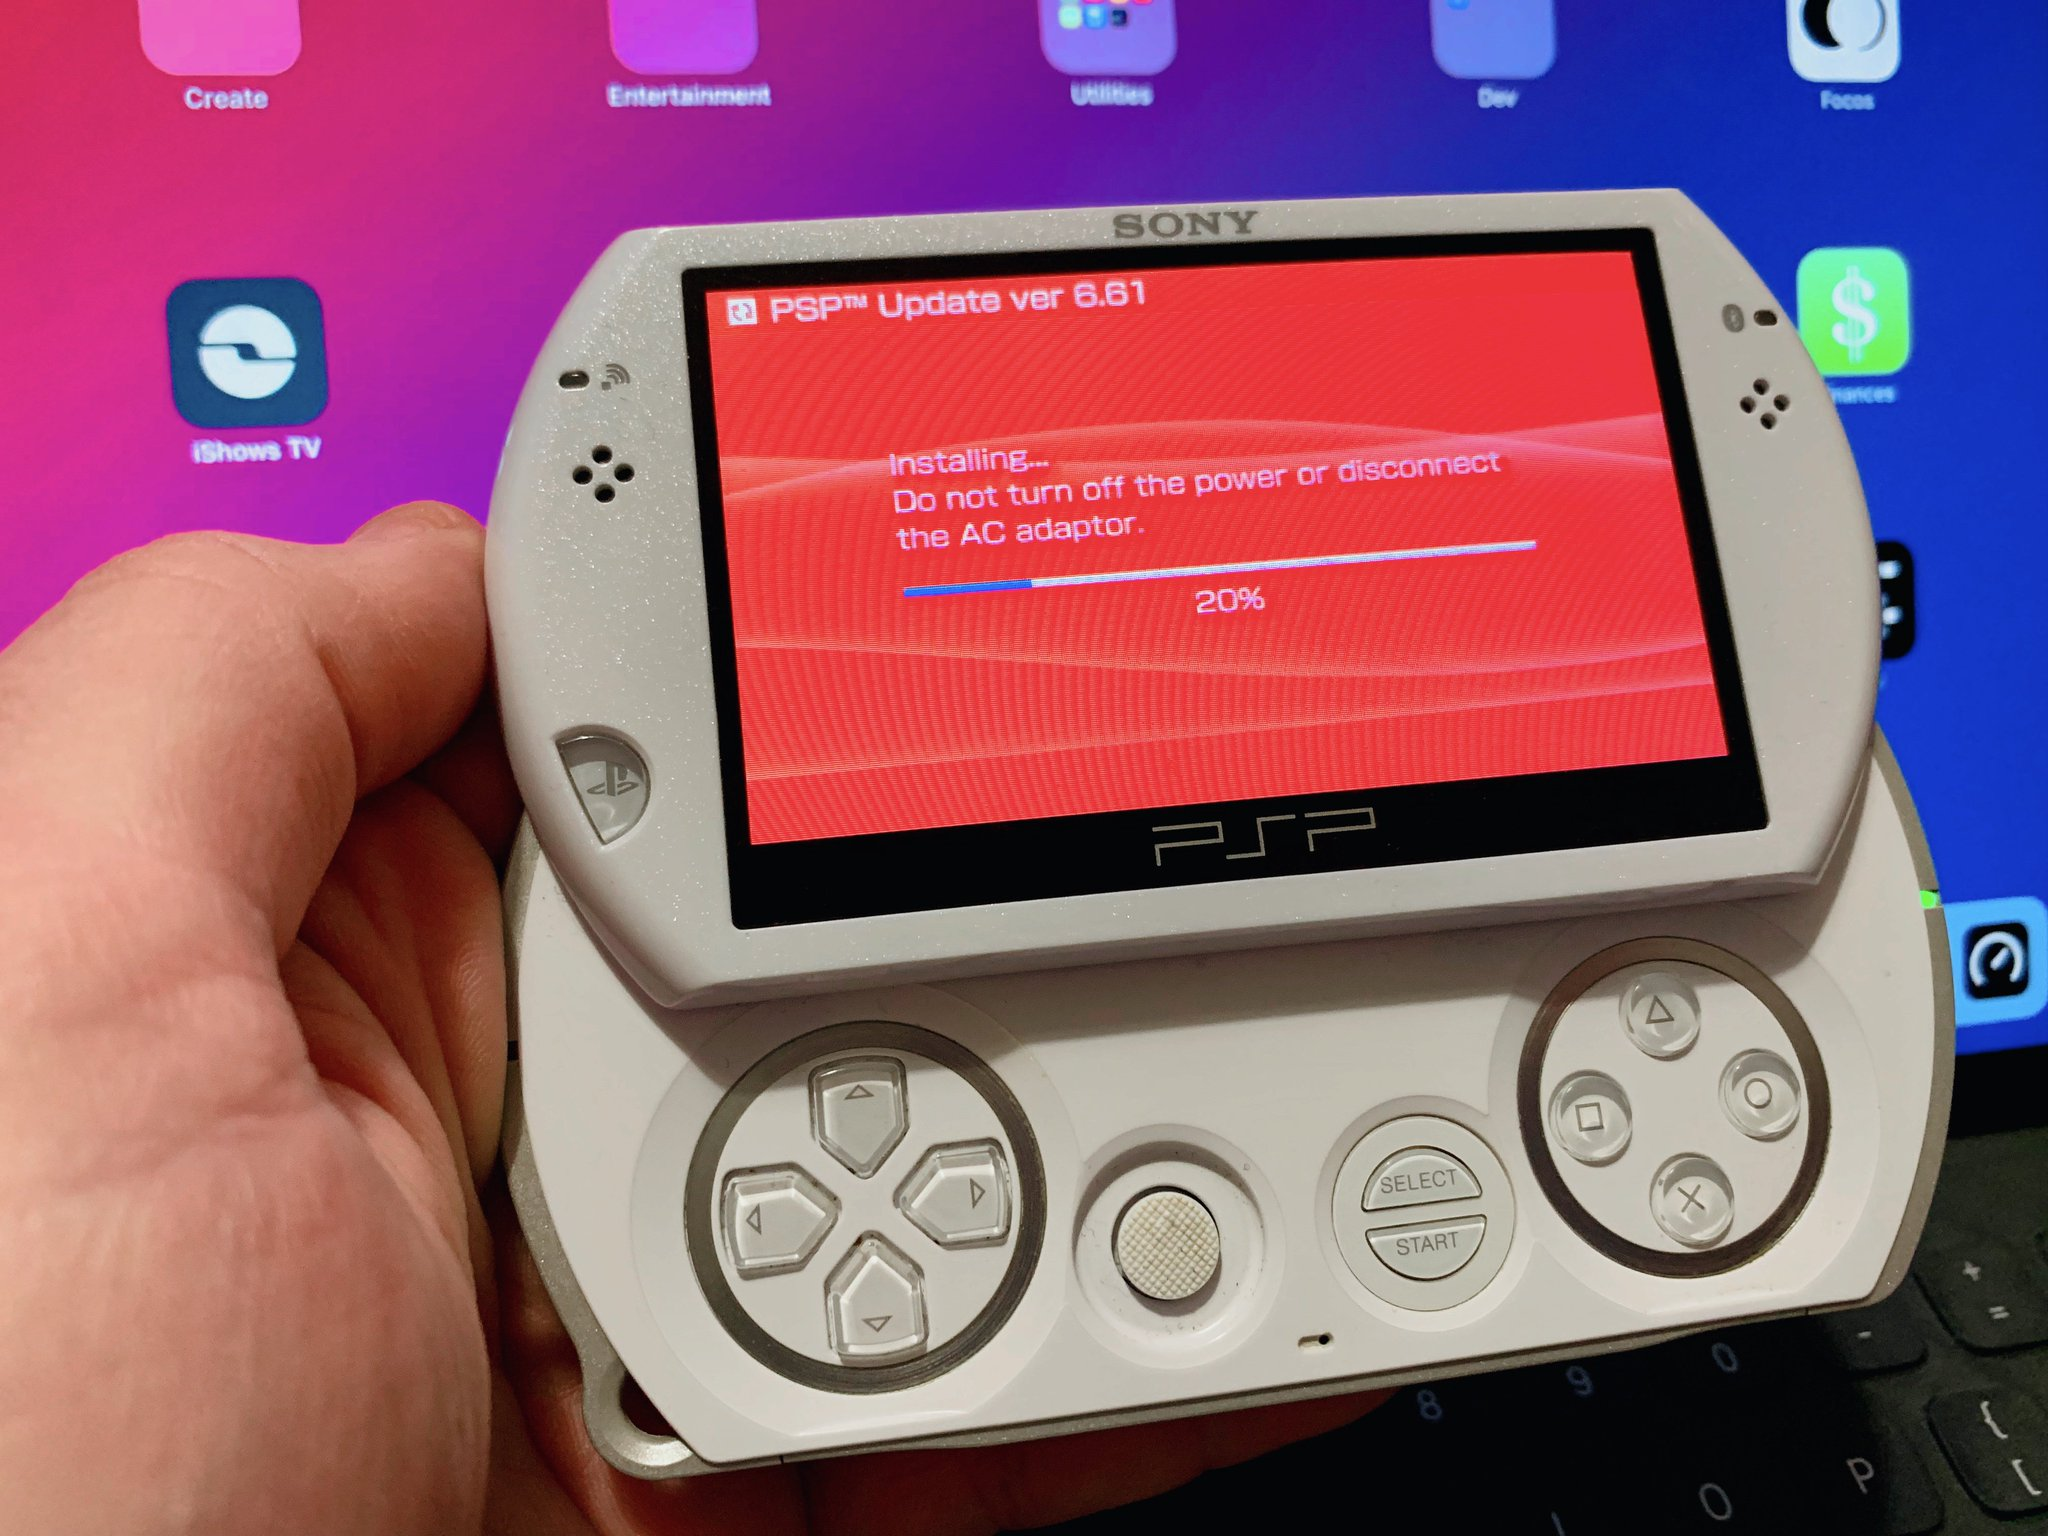 Sony vaio vgx-tp20e media center pc reviewed.